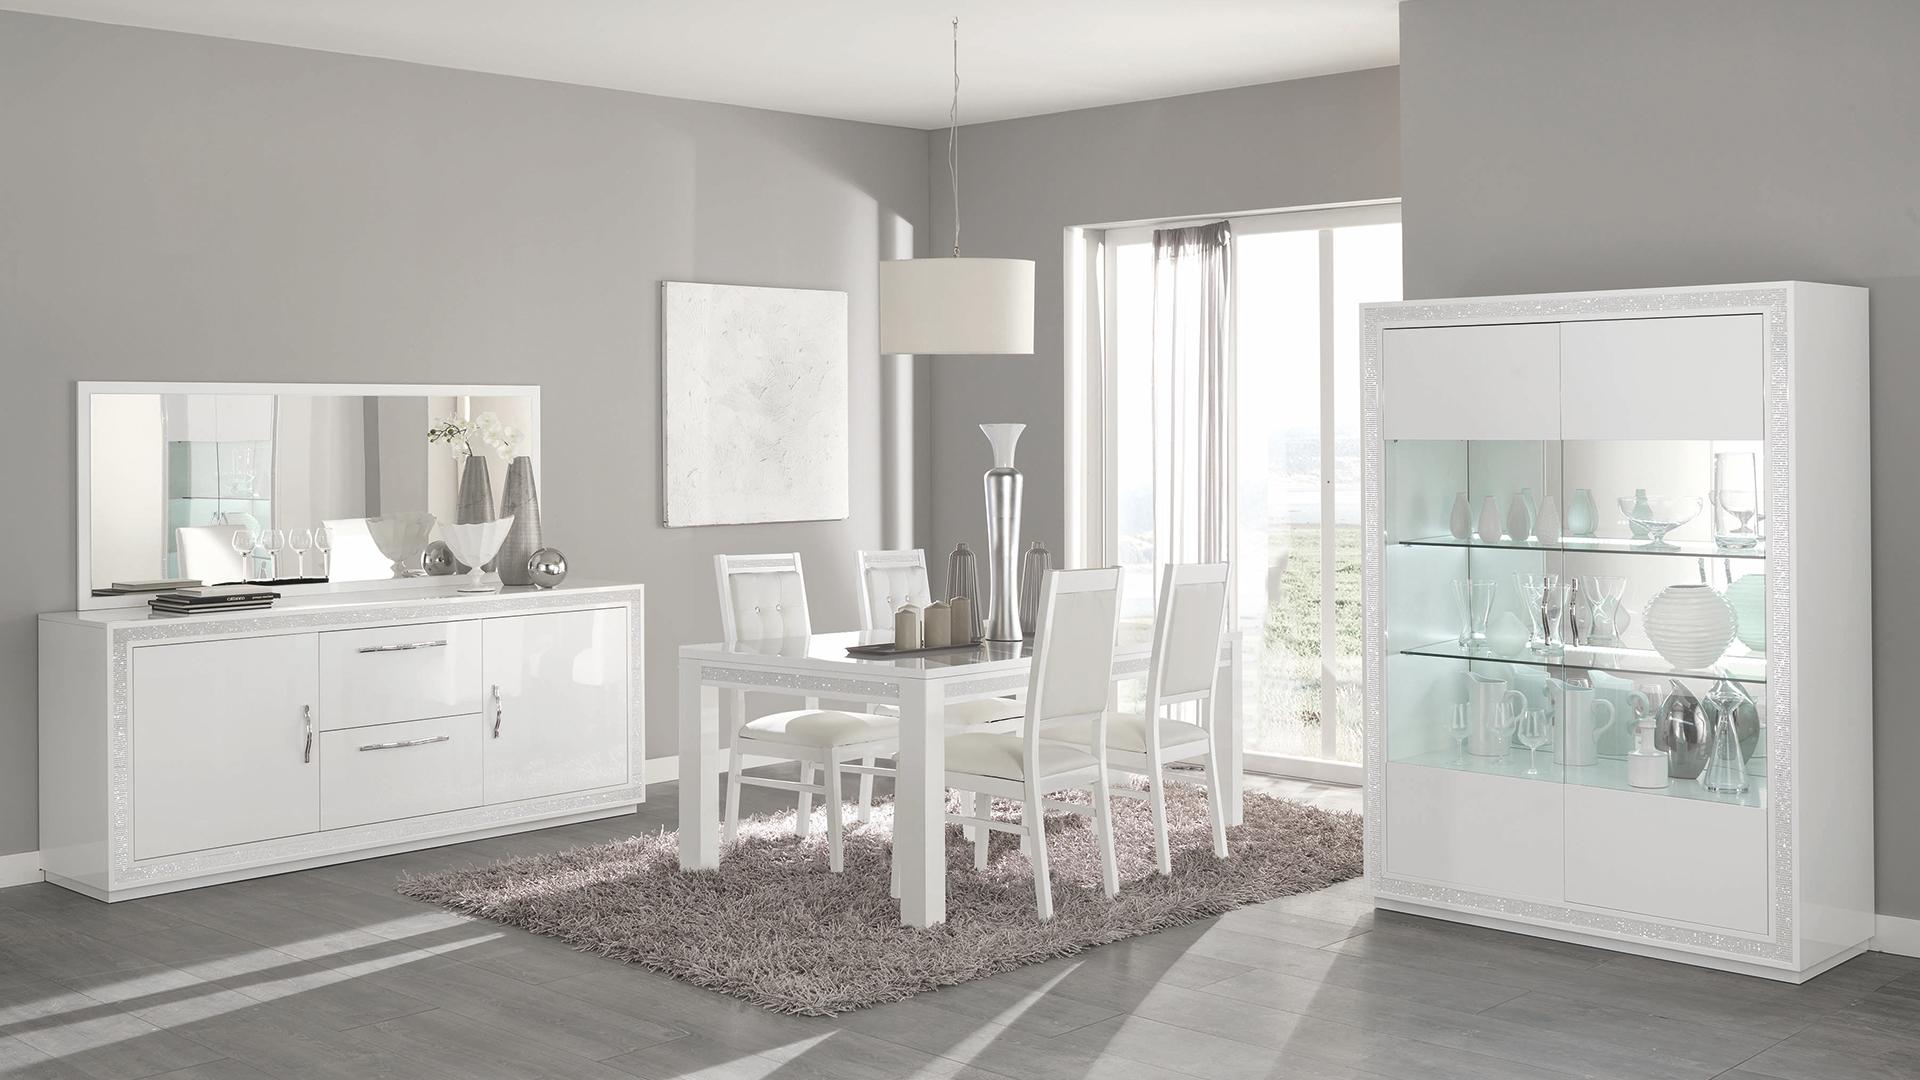 cristal klassische esszimmer yuvam m belhaus in wuppertal cilek offizieller h ndler in europa. Black Bedroom Furniture Sets. Home Design Ideas